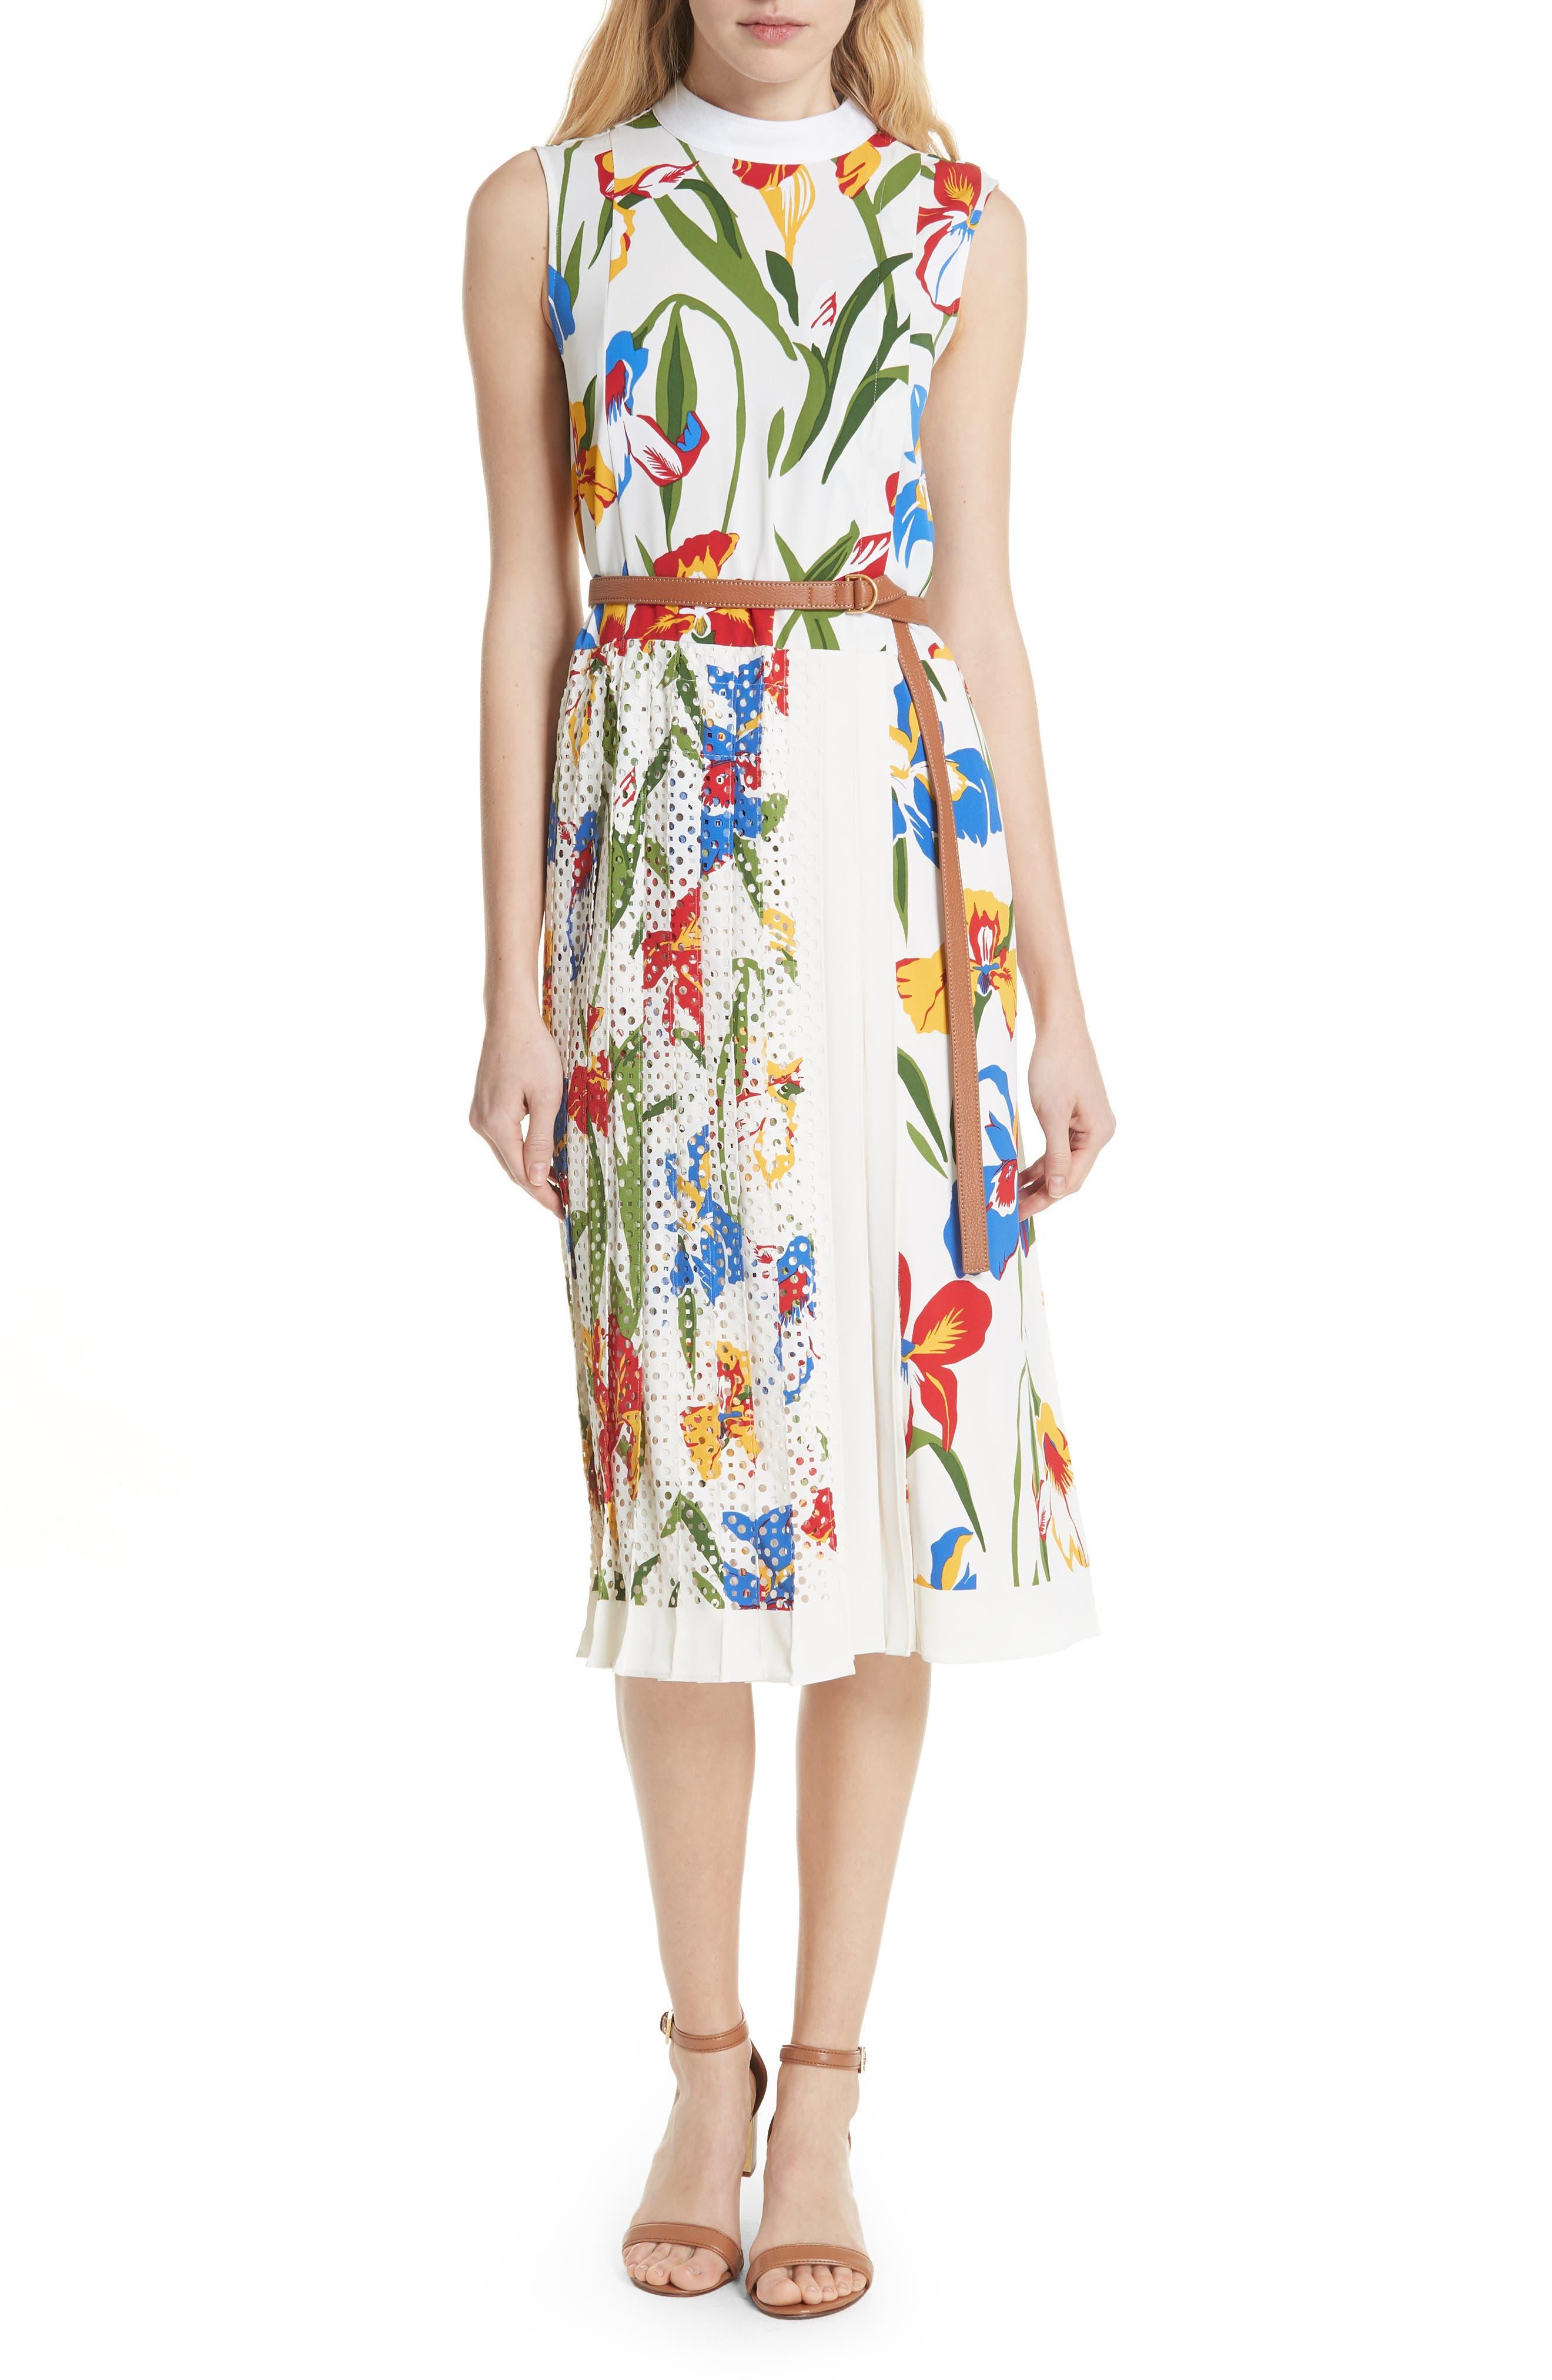 Carine Floral Dress,                             Main thumbnail 1, color,                             Painted Iris